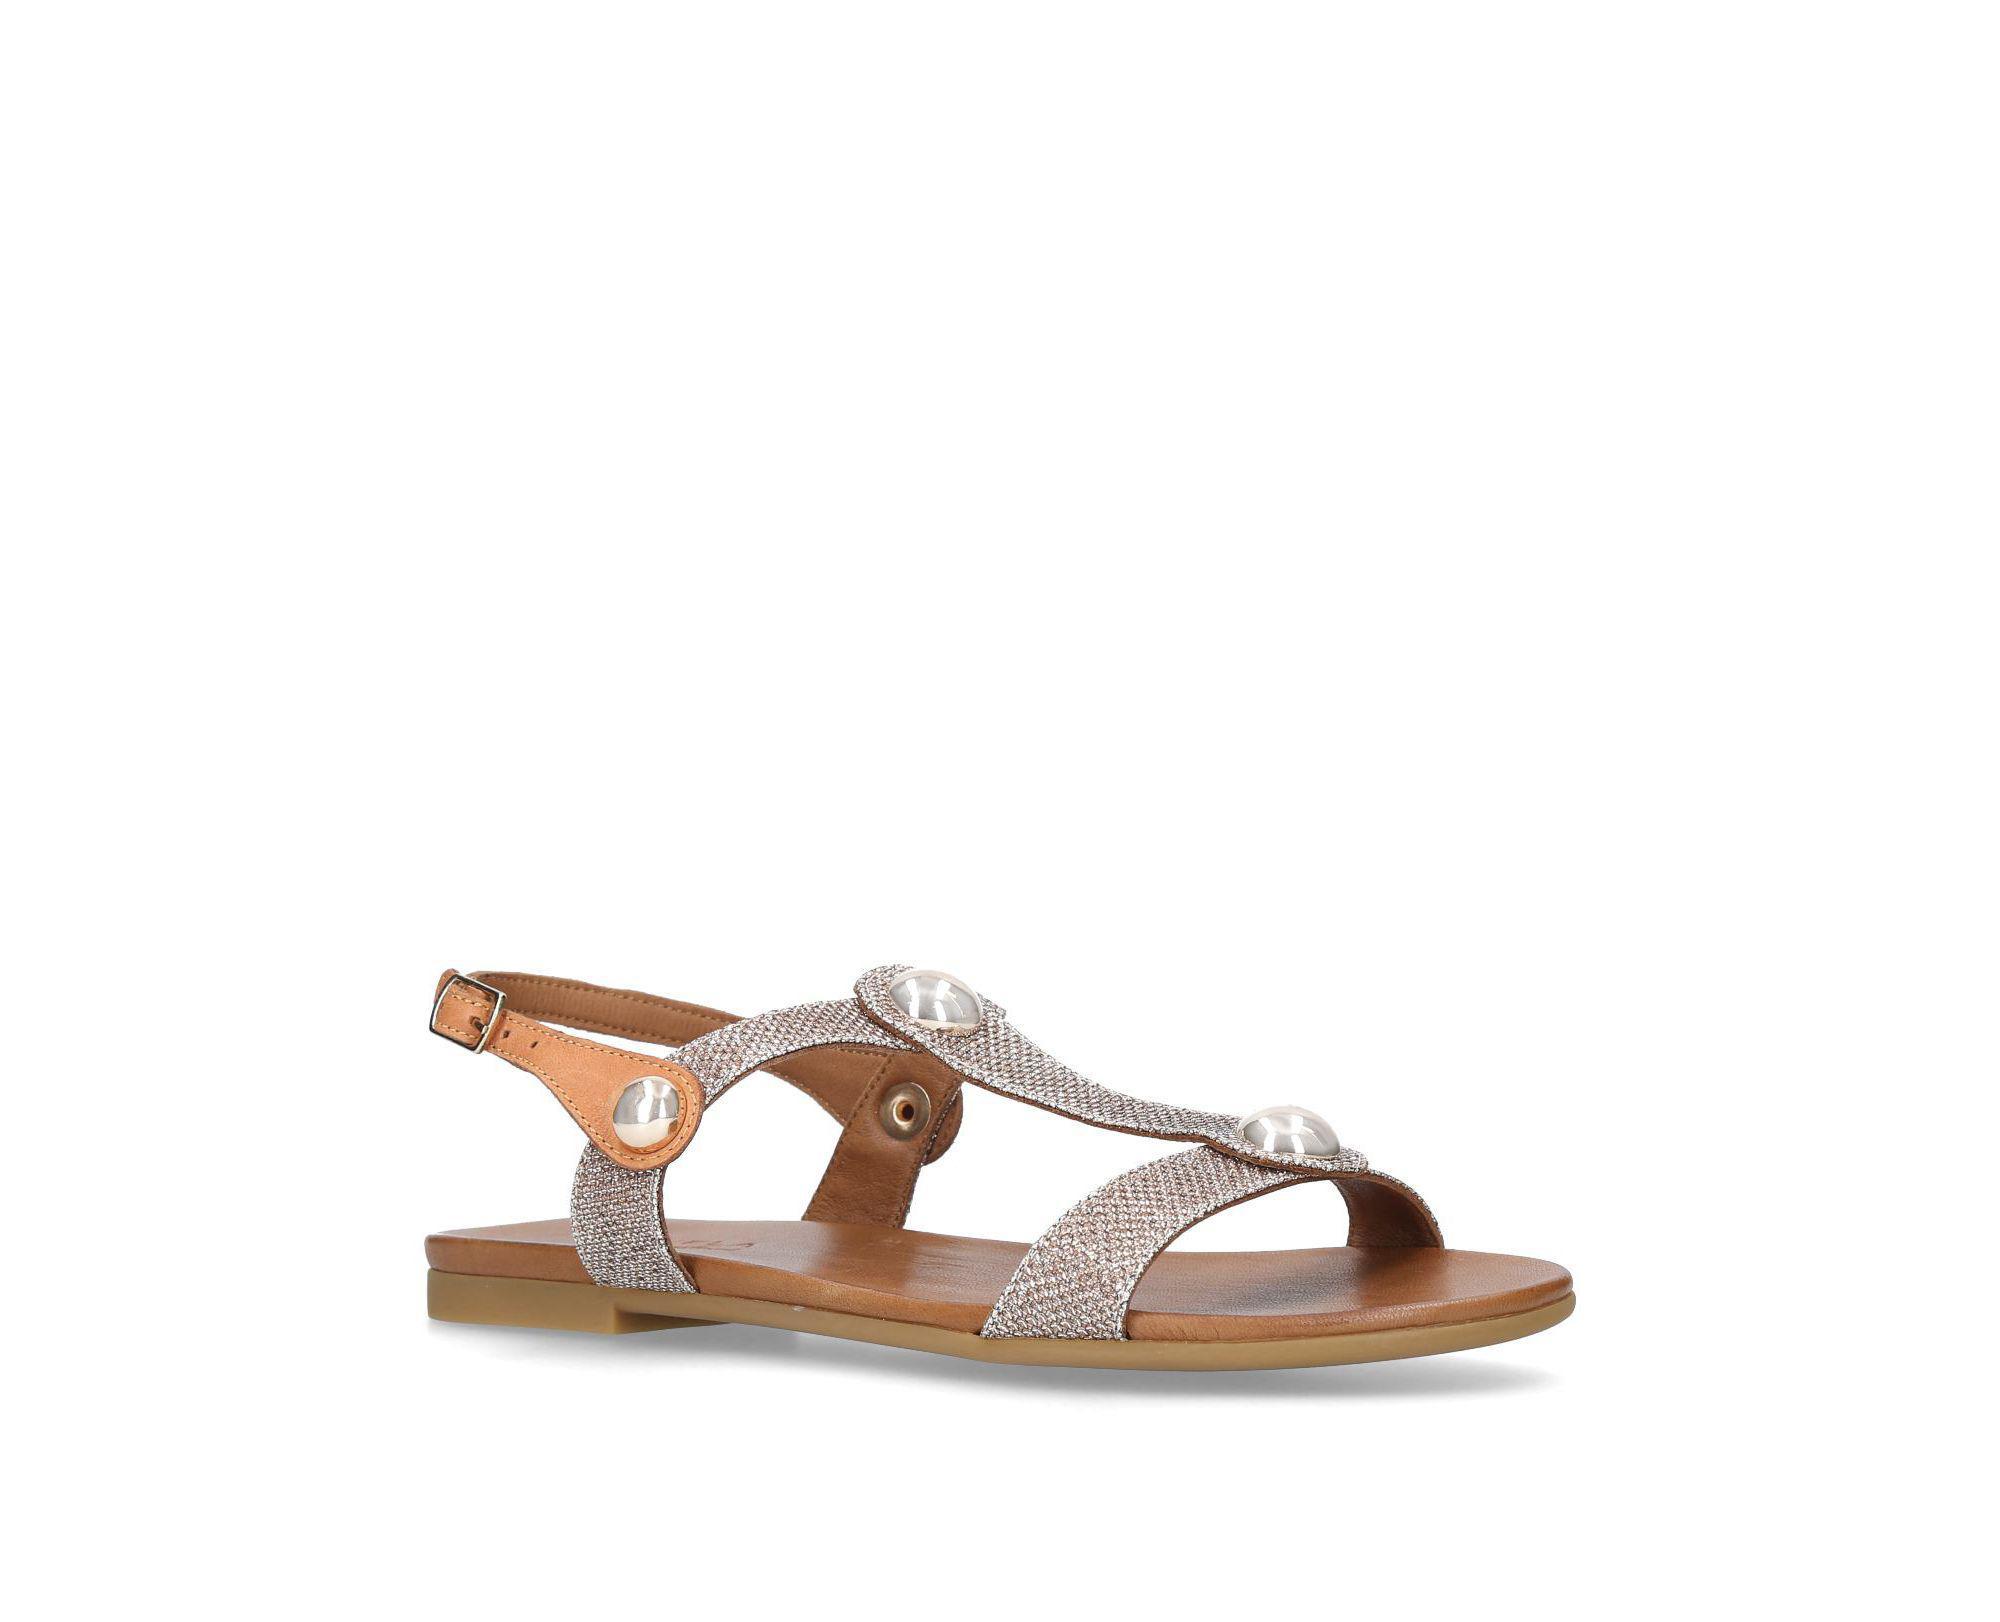 b22ce128e3ae Carvela Kurt Geiger Gold  saz  Flat Sandals in Metallic - Save 40 ...